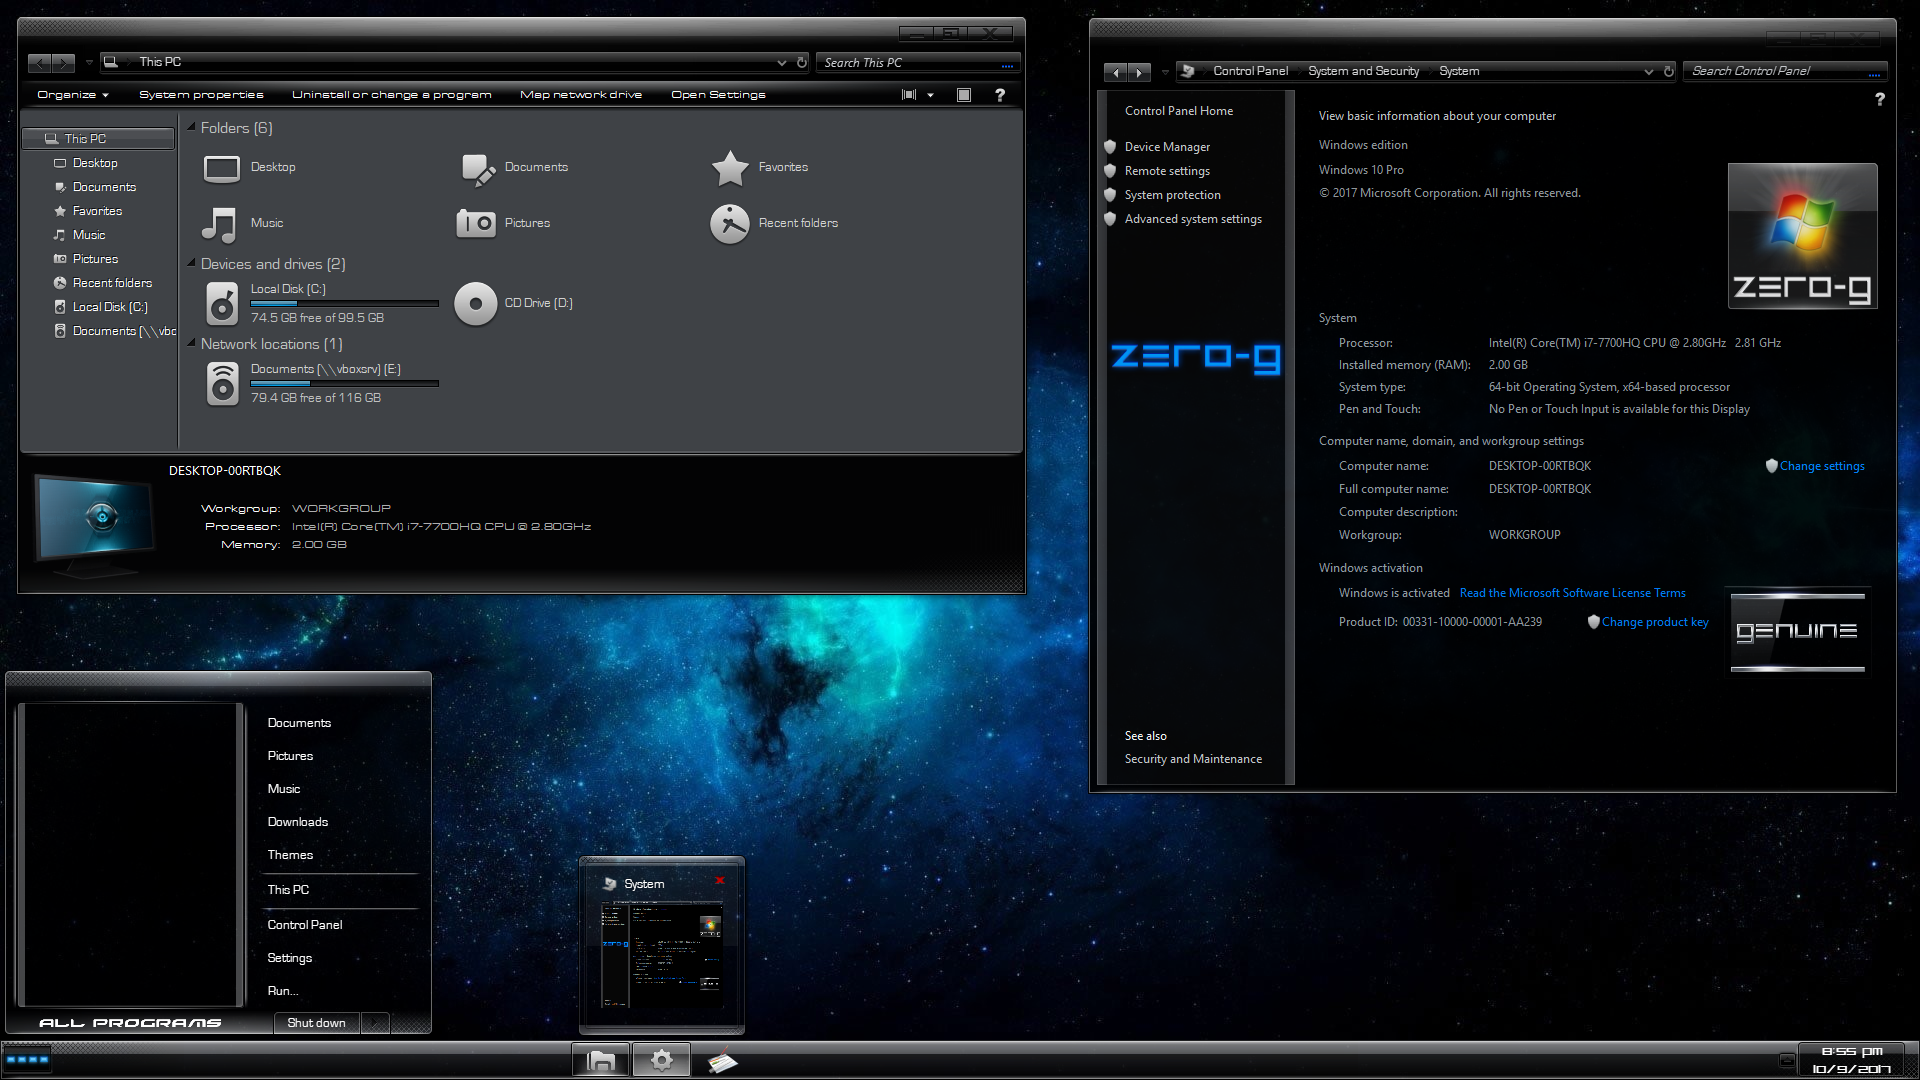 TUF Covert Ops for Windows 10 Build 1903-21h2